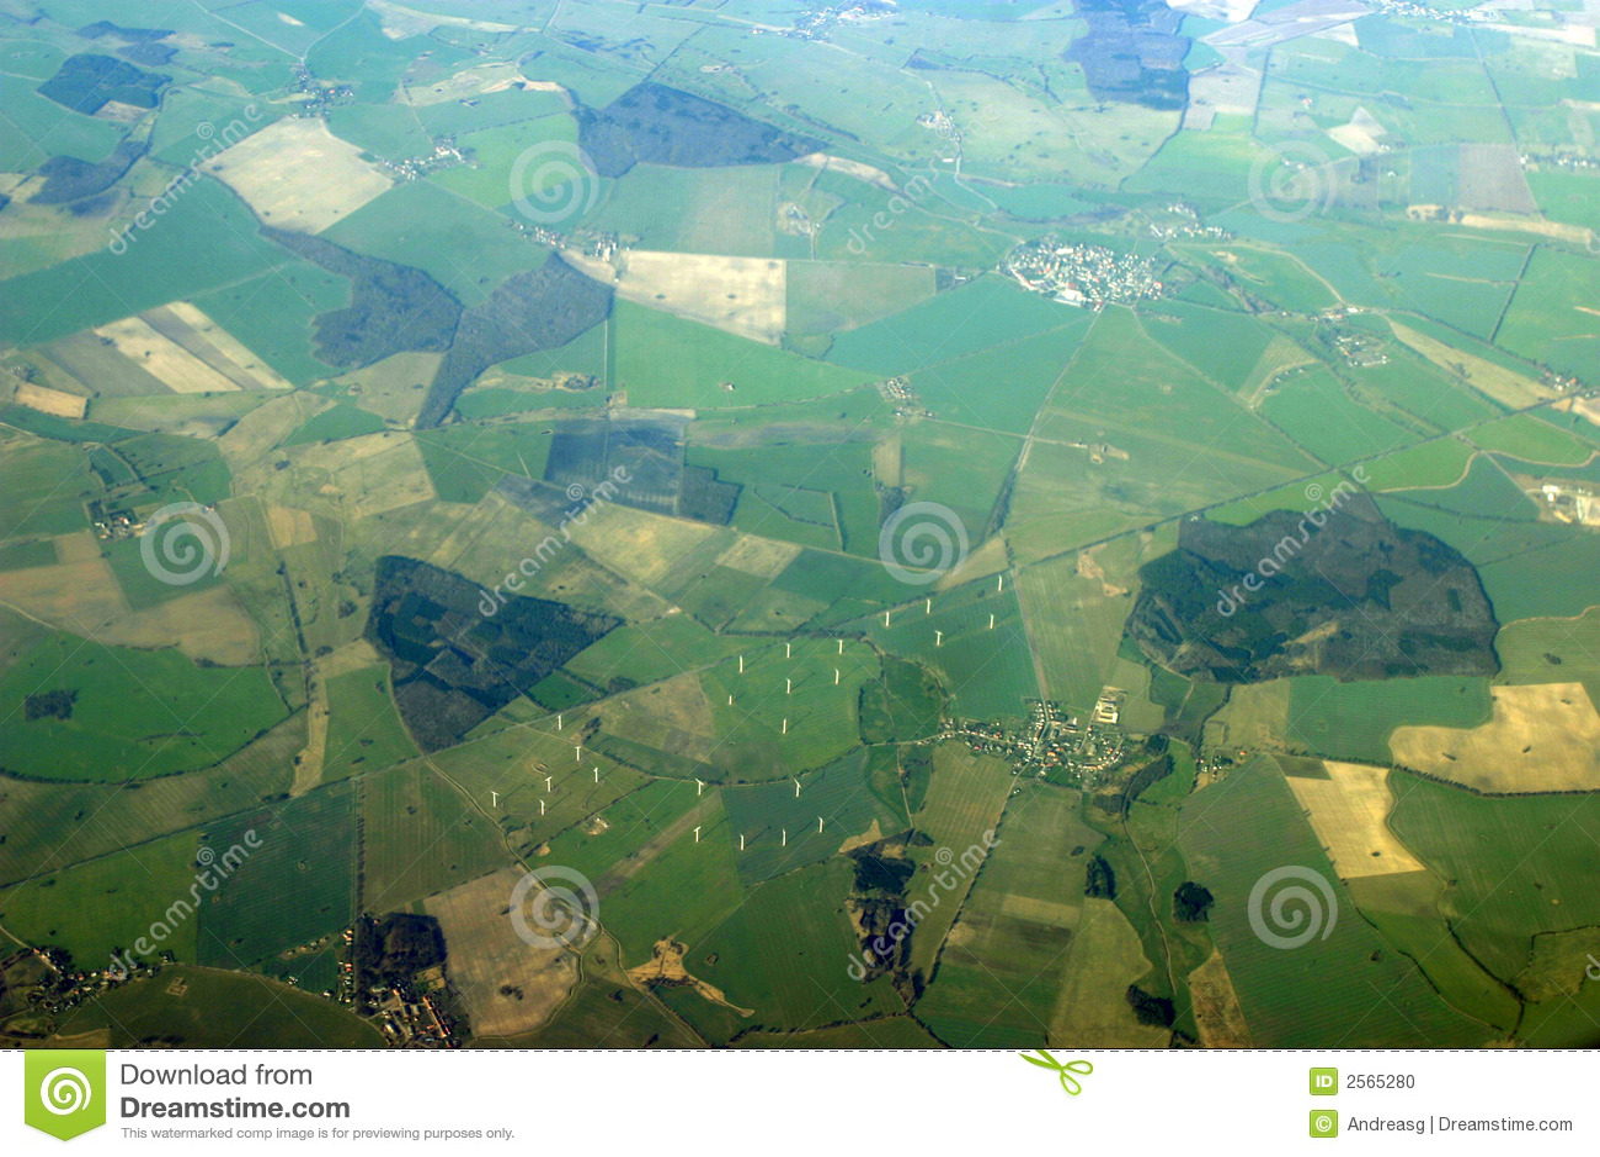 Aerial view - windmills